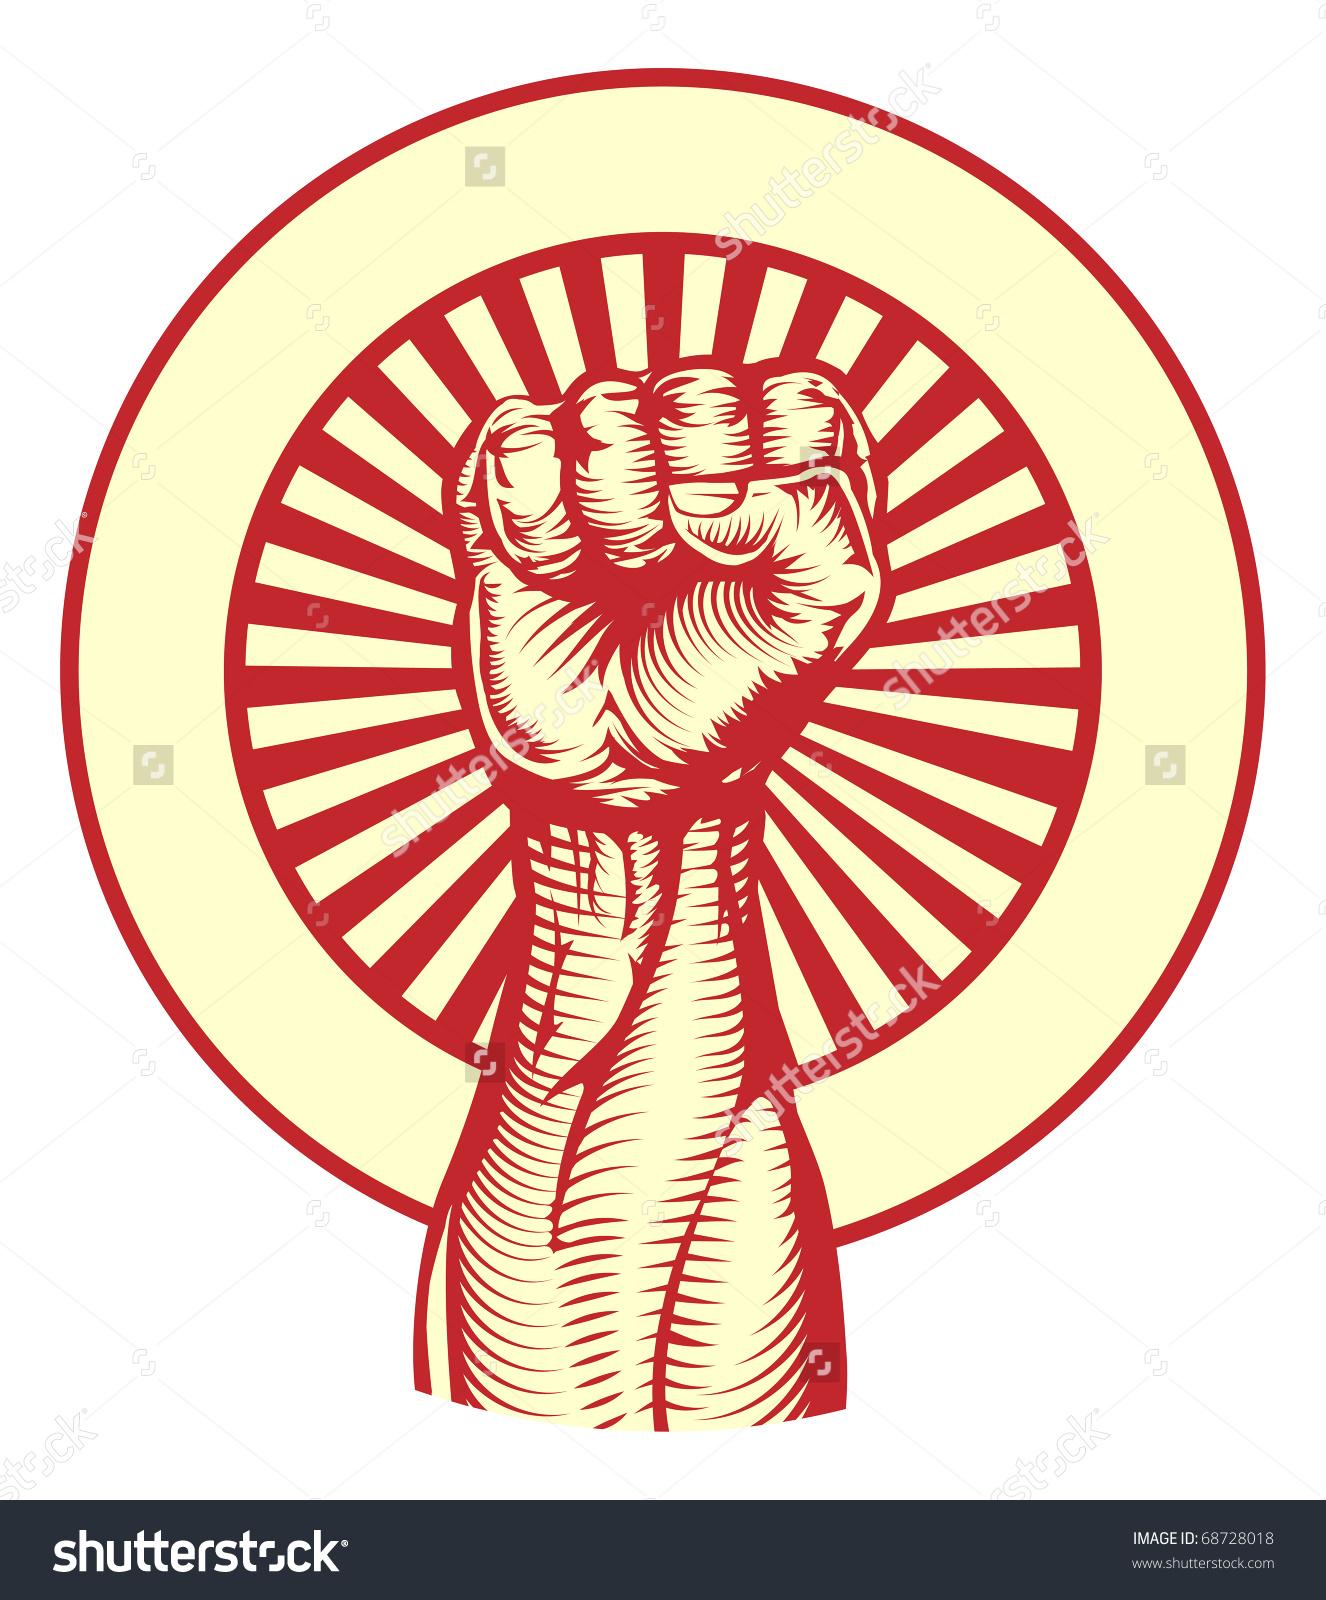 Revolution clipart propaganda More (Easter – on Revolution